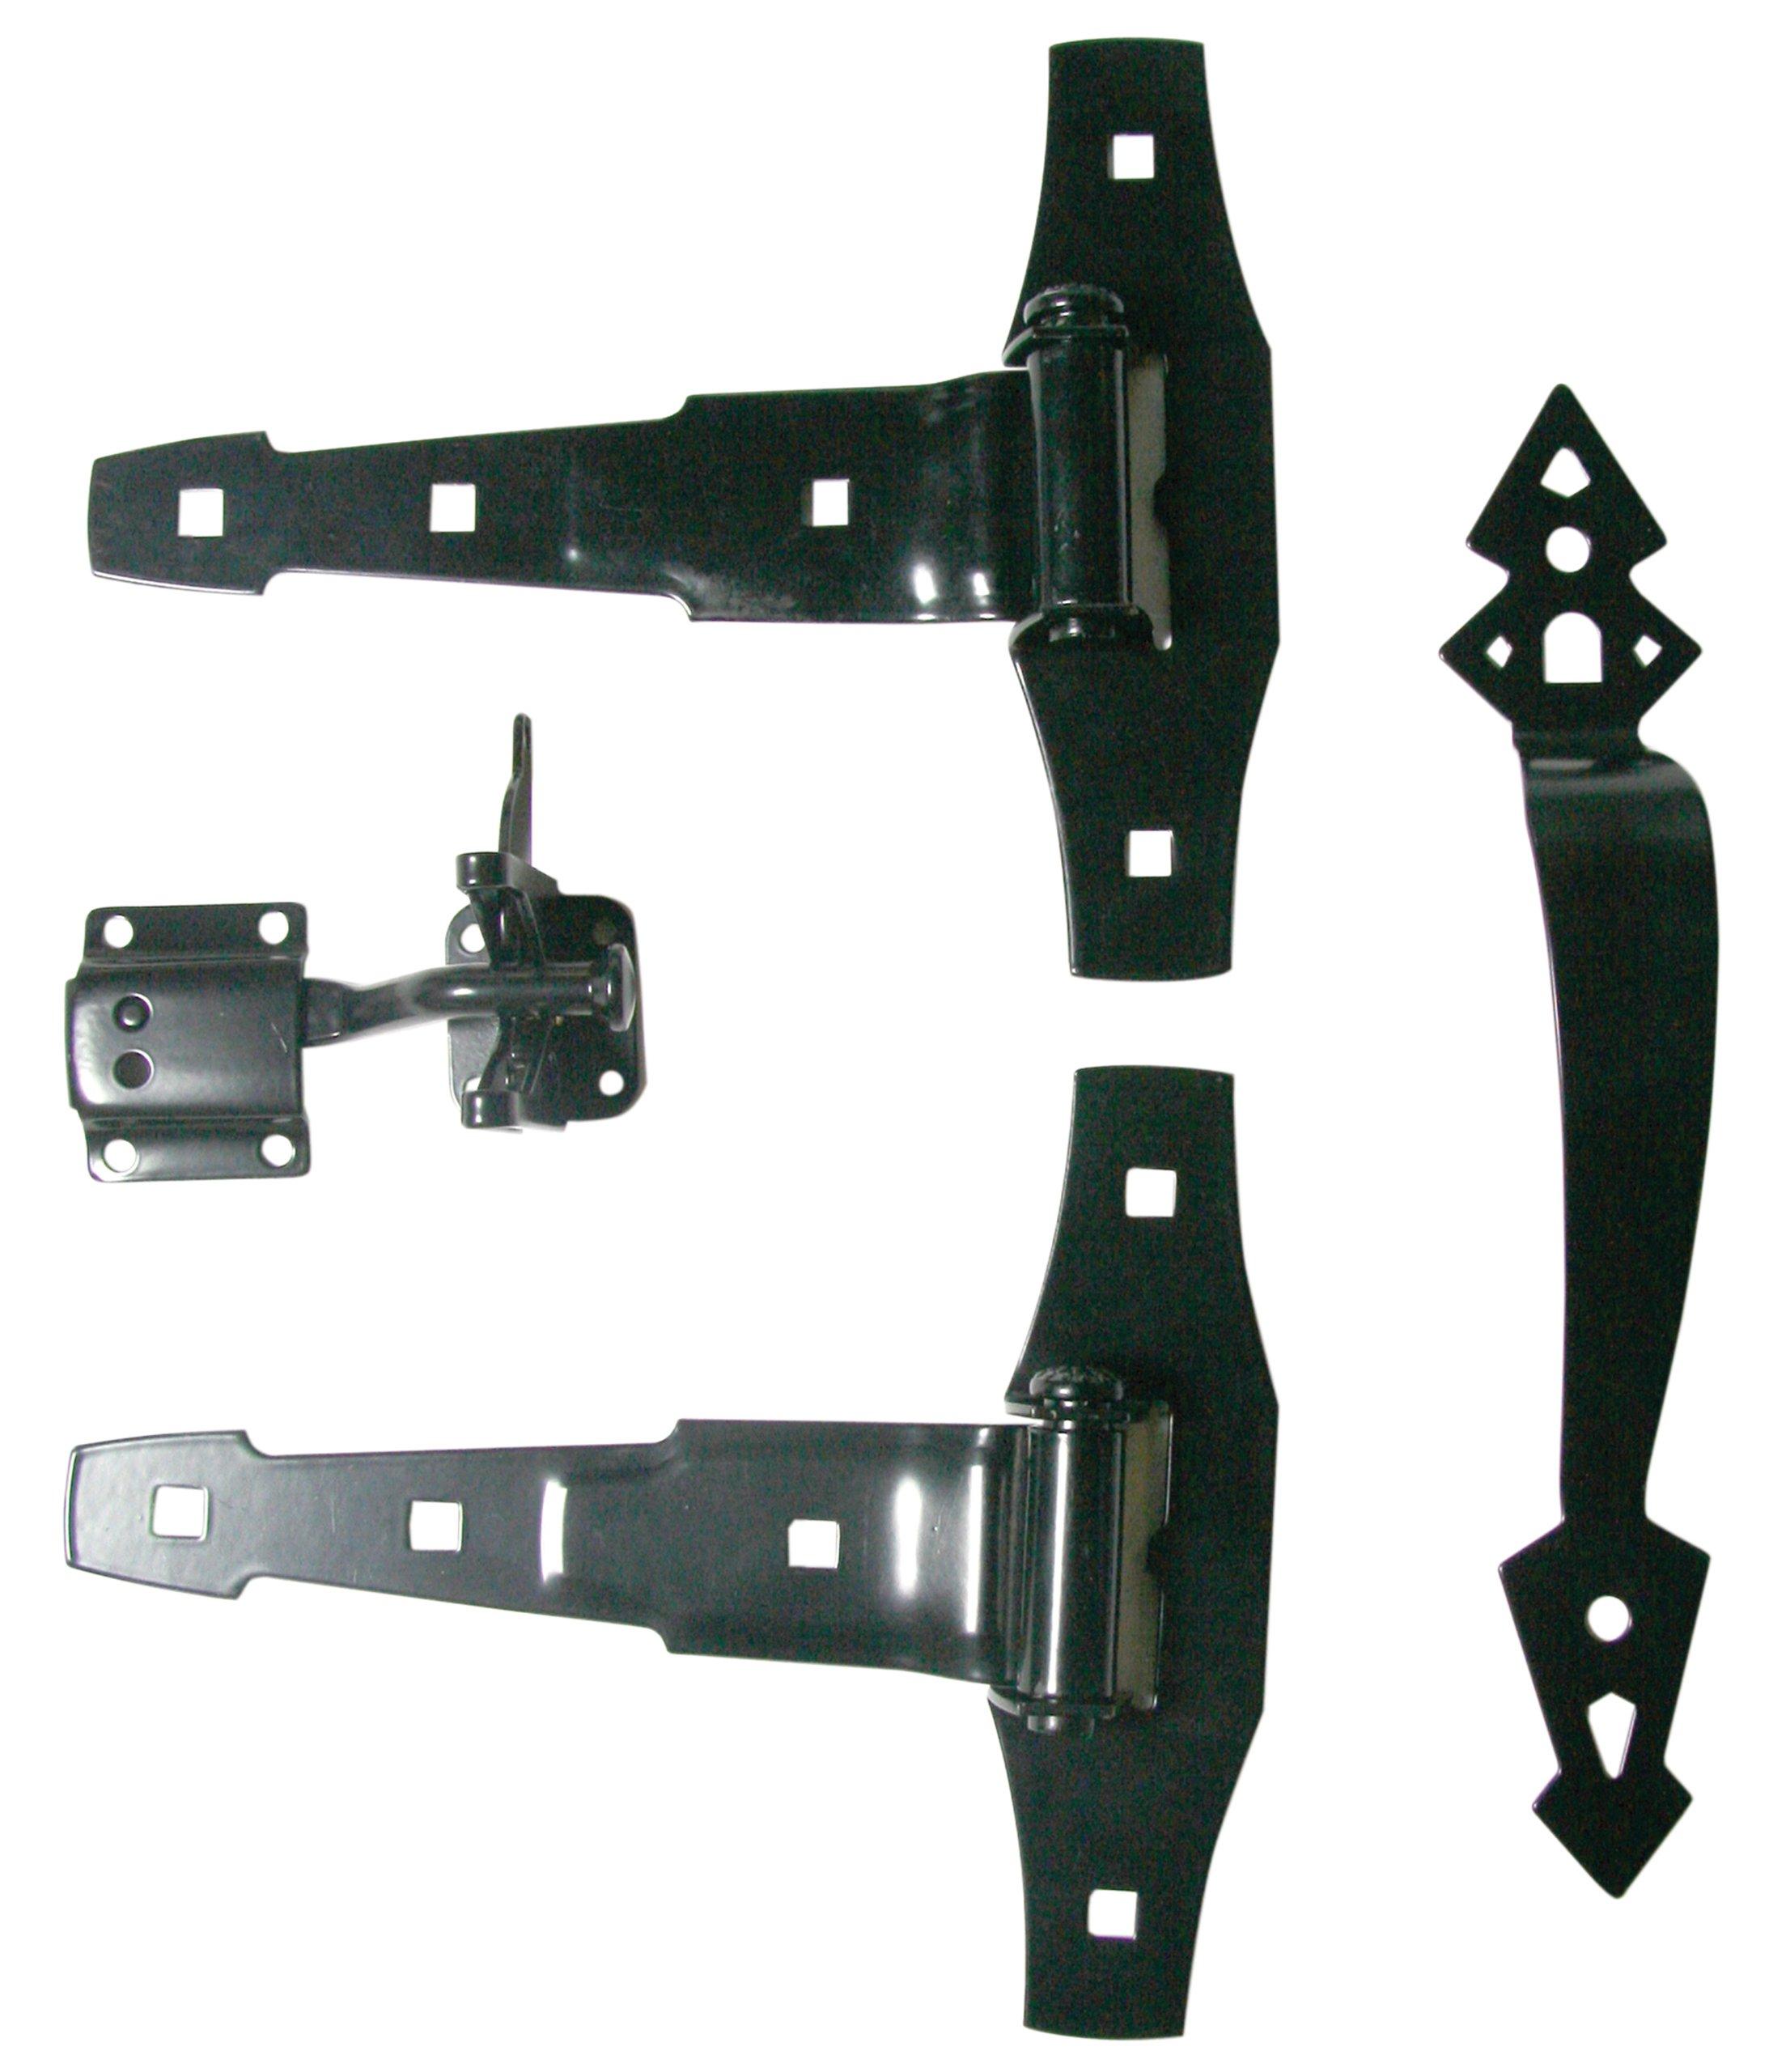 Ultra Hardware 35921 Spring T-Hinge Kit, Black